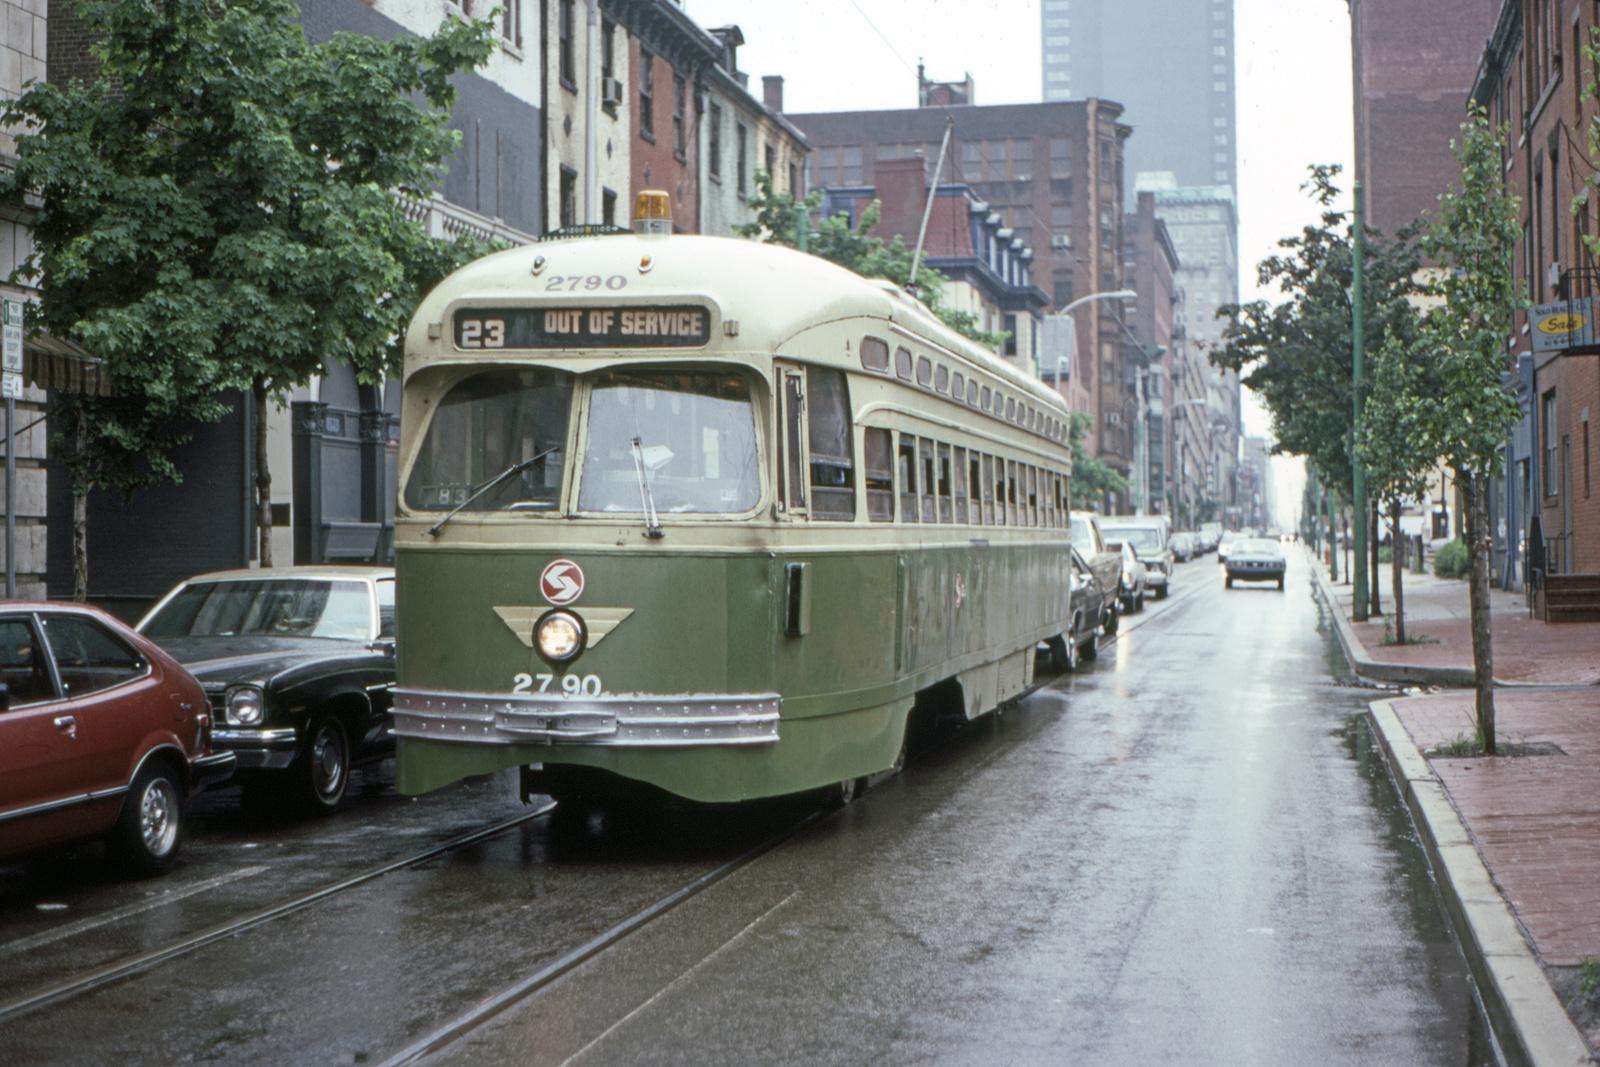 (752k, 1600x1067)<br><b>Country:</b> United States<br><b>City:</b> Philadelphia, PA<br><b>System:</b> SEPTA (or Predecessor)<br><b>Line:</b> Rt. 23-Germantown<br><b>Location:</b> 12th/Manning<br><b>Car:</b> PTC/SEPTA Postwar All-electric PCC (St.Louis, 1947) 2790 <br><b>Collection of:</b> David Pirmann<br><b>Date:</b> 5/22/1983<br><b>Viewed (this week/total):</b> 0 / 65